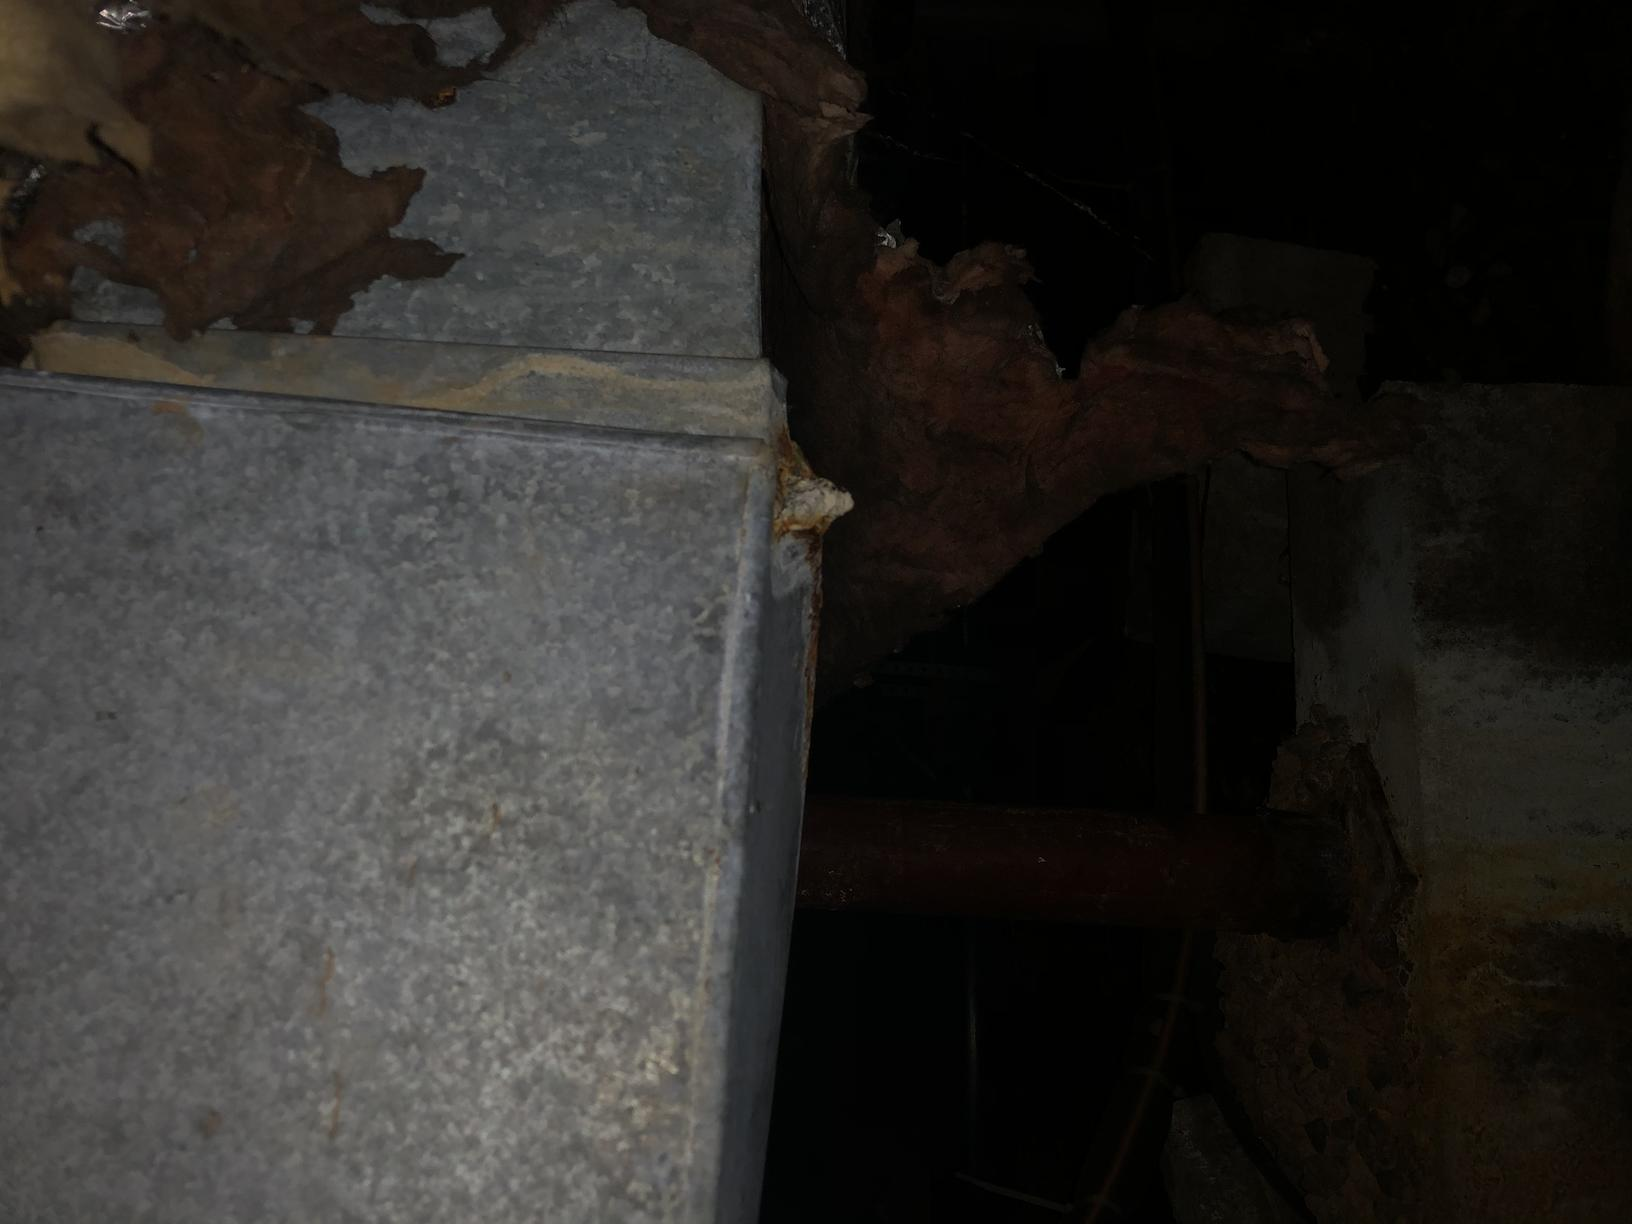 Rust in crawl space